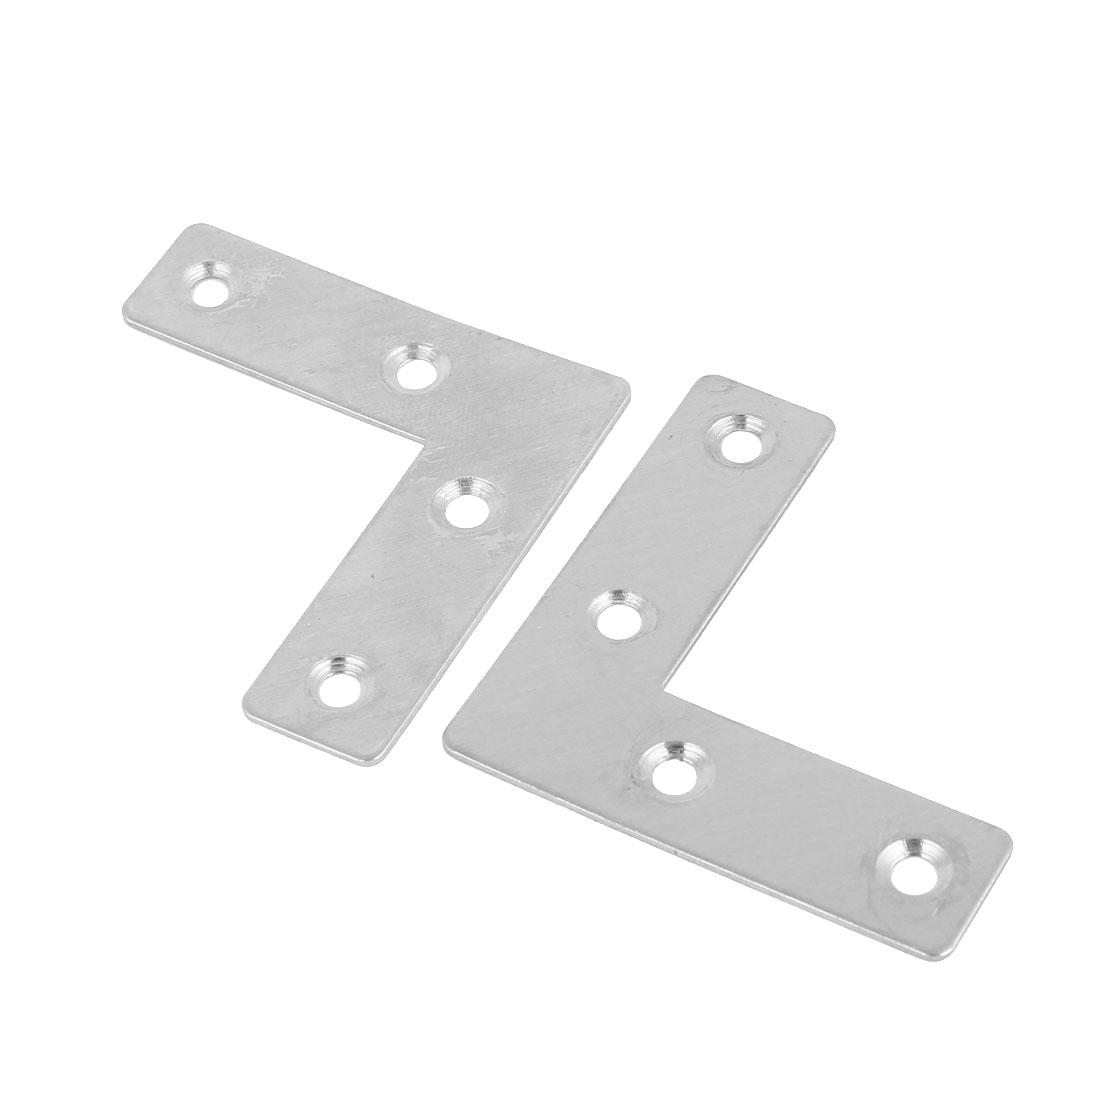 51mmx51mm 90 Degree L Shaped Stainless Steel Angle Bracket Corner Brace 2 Pcs